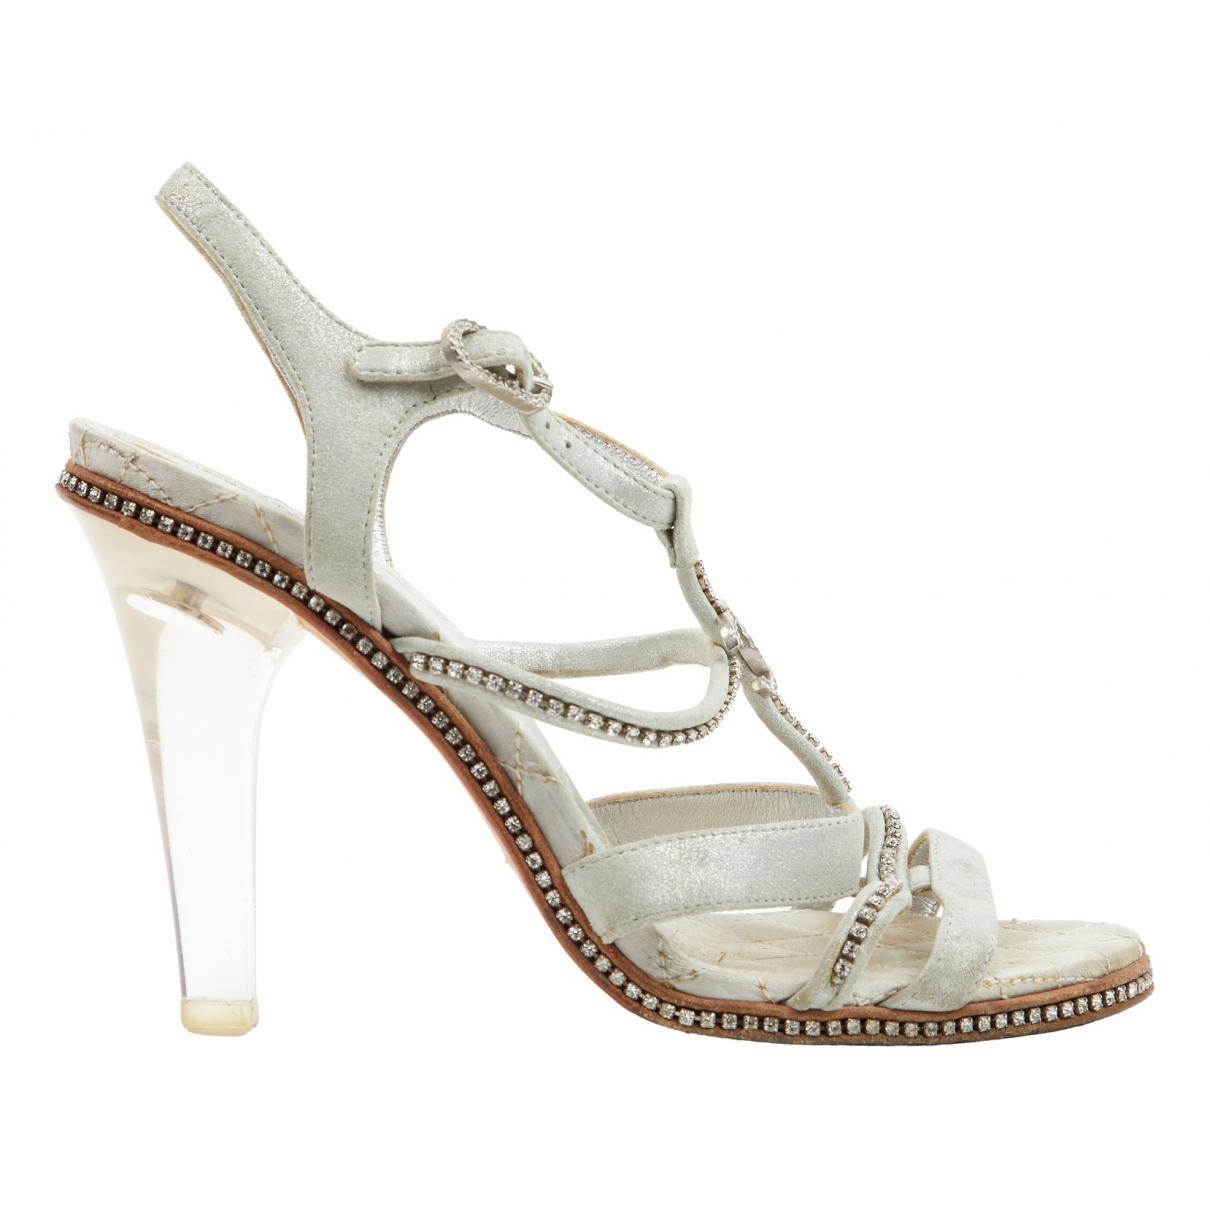 Chanel N Beige Suede Sandals for Women 36.5 EU